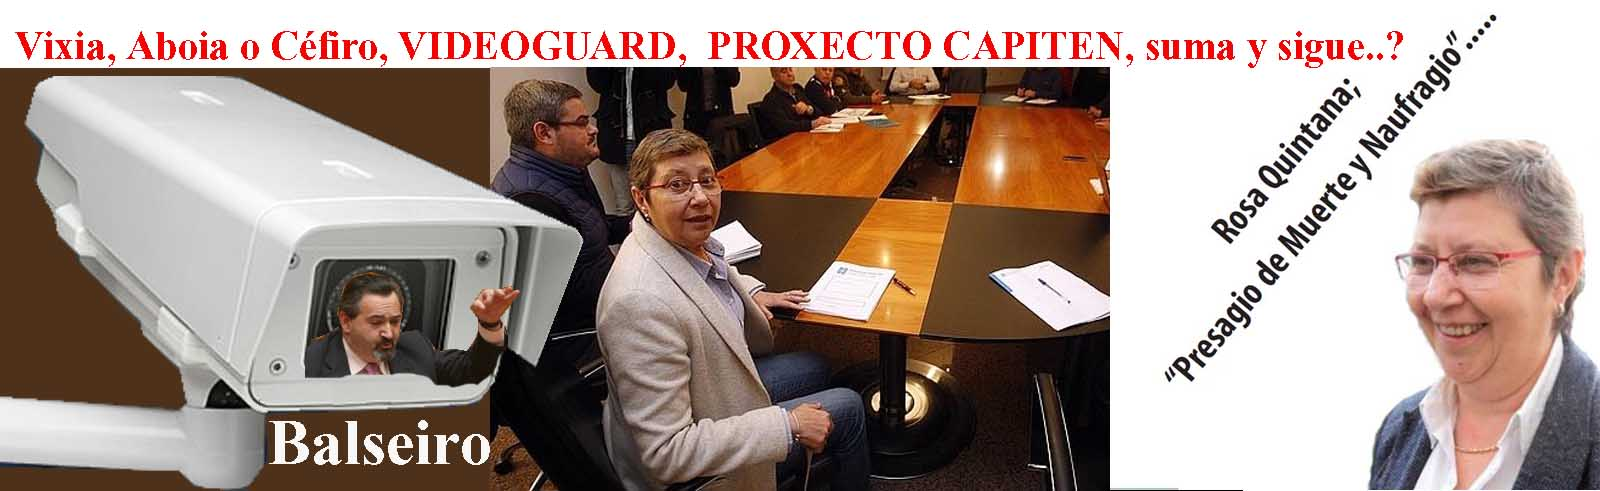 balseiro proxecto videoguarda y otros desaprecidos nadiesabenadaenelPPdeG